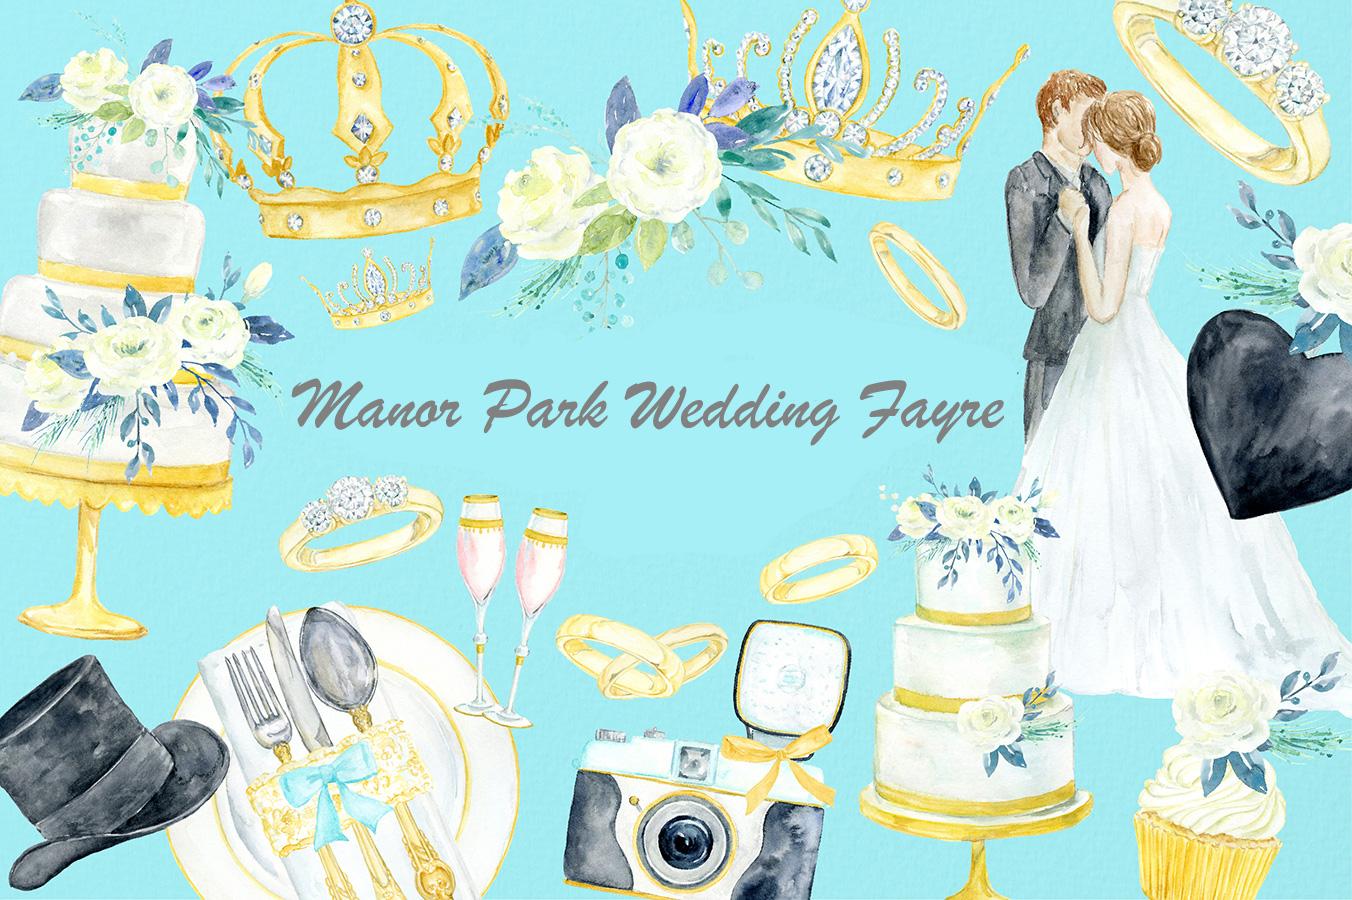 manor-park-wedding-fayre